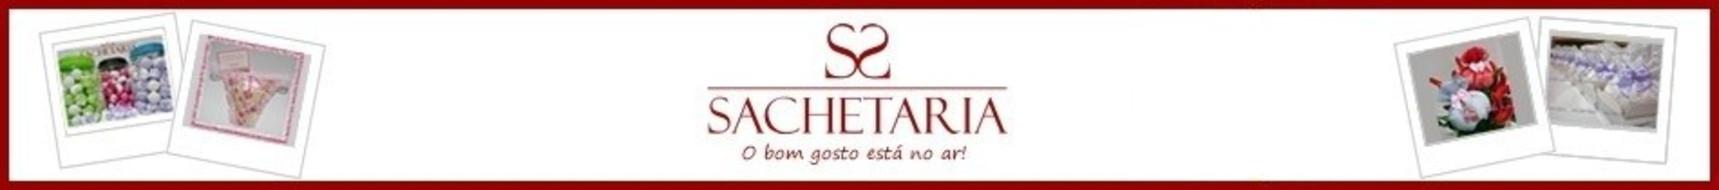 SACHETARIA